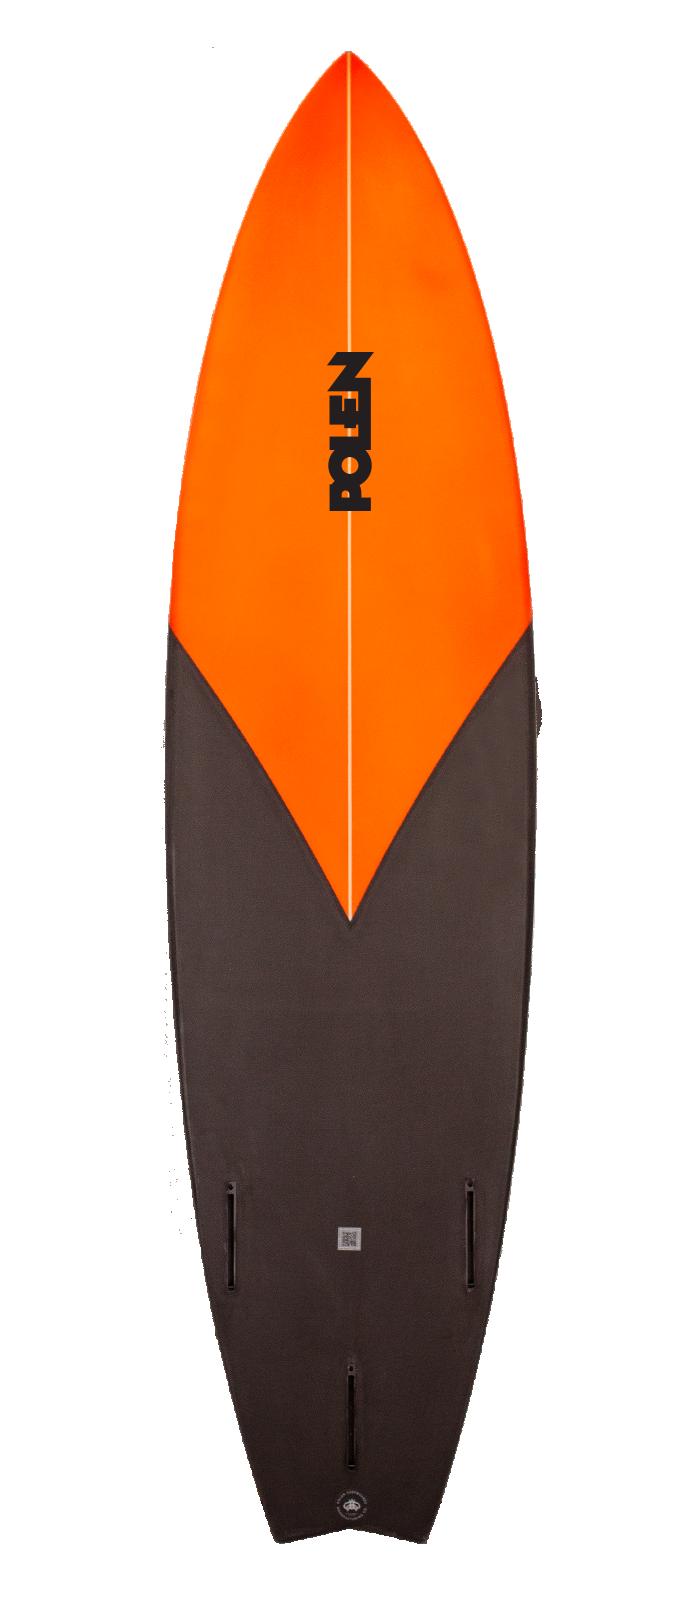 CANNONBALL surfboard model bottom